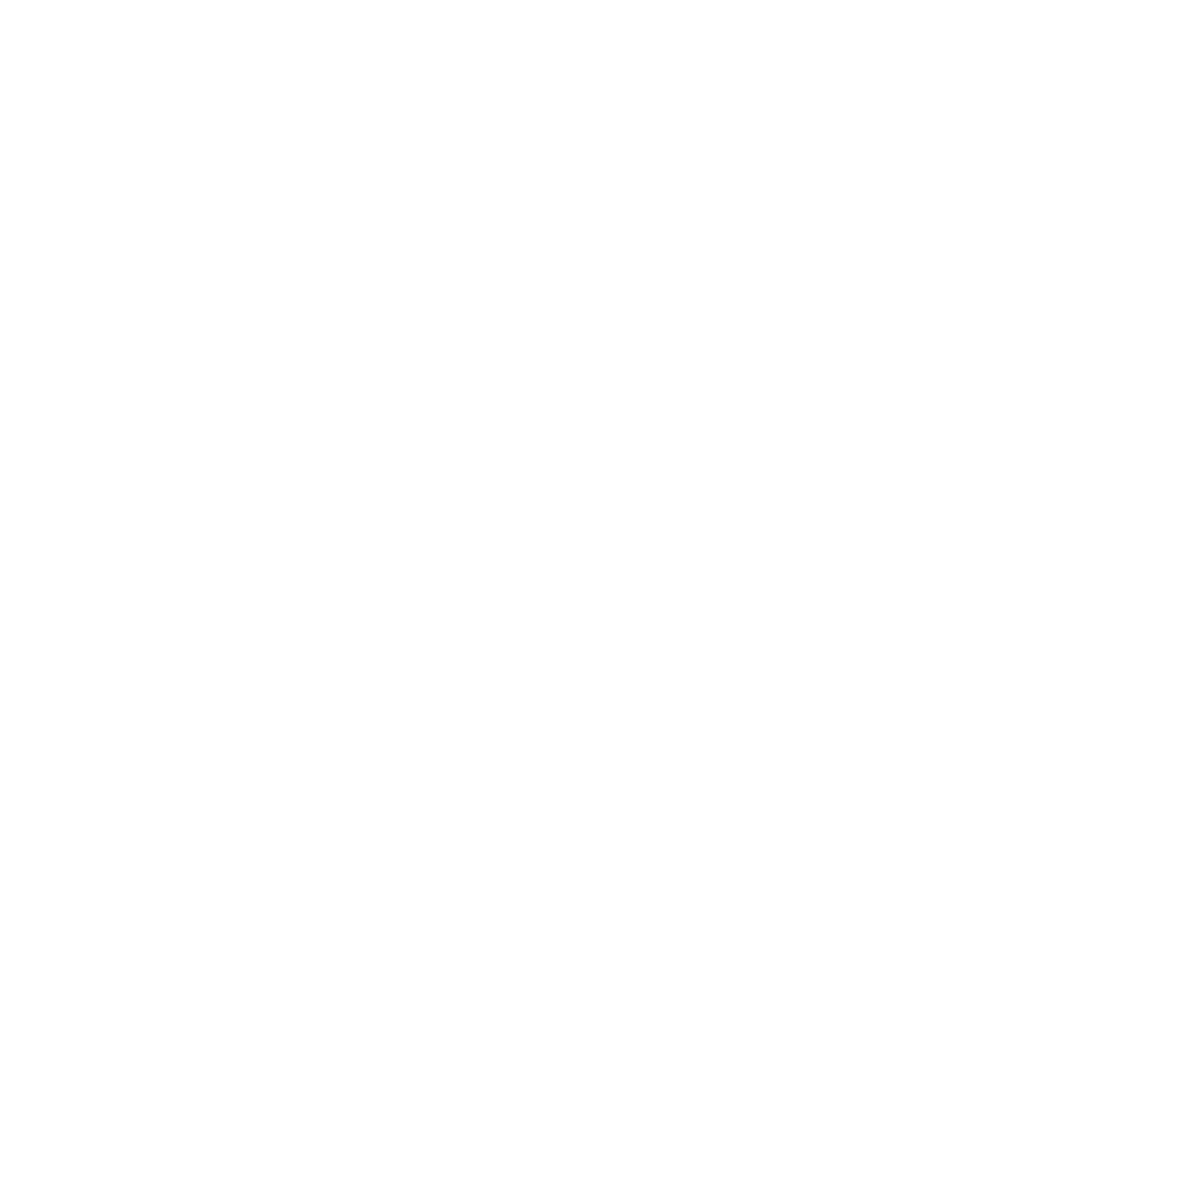 Slate digital collection for mac torrent 64-bit